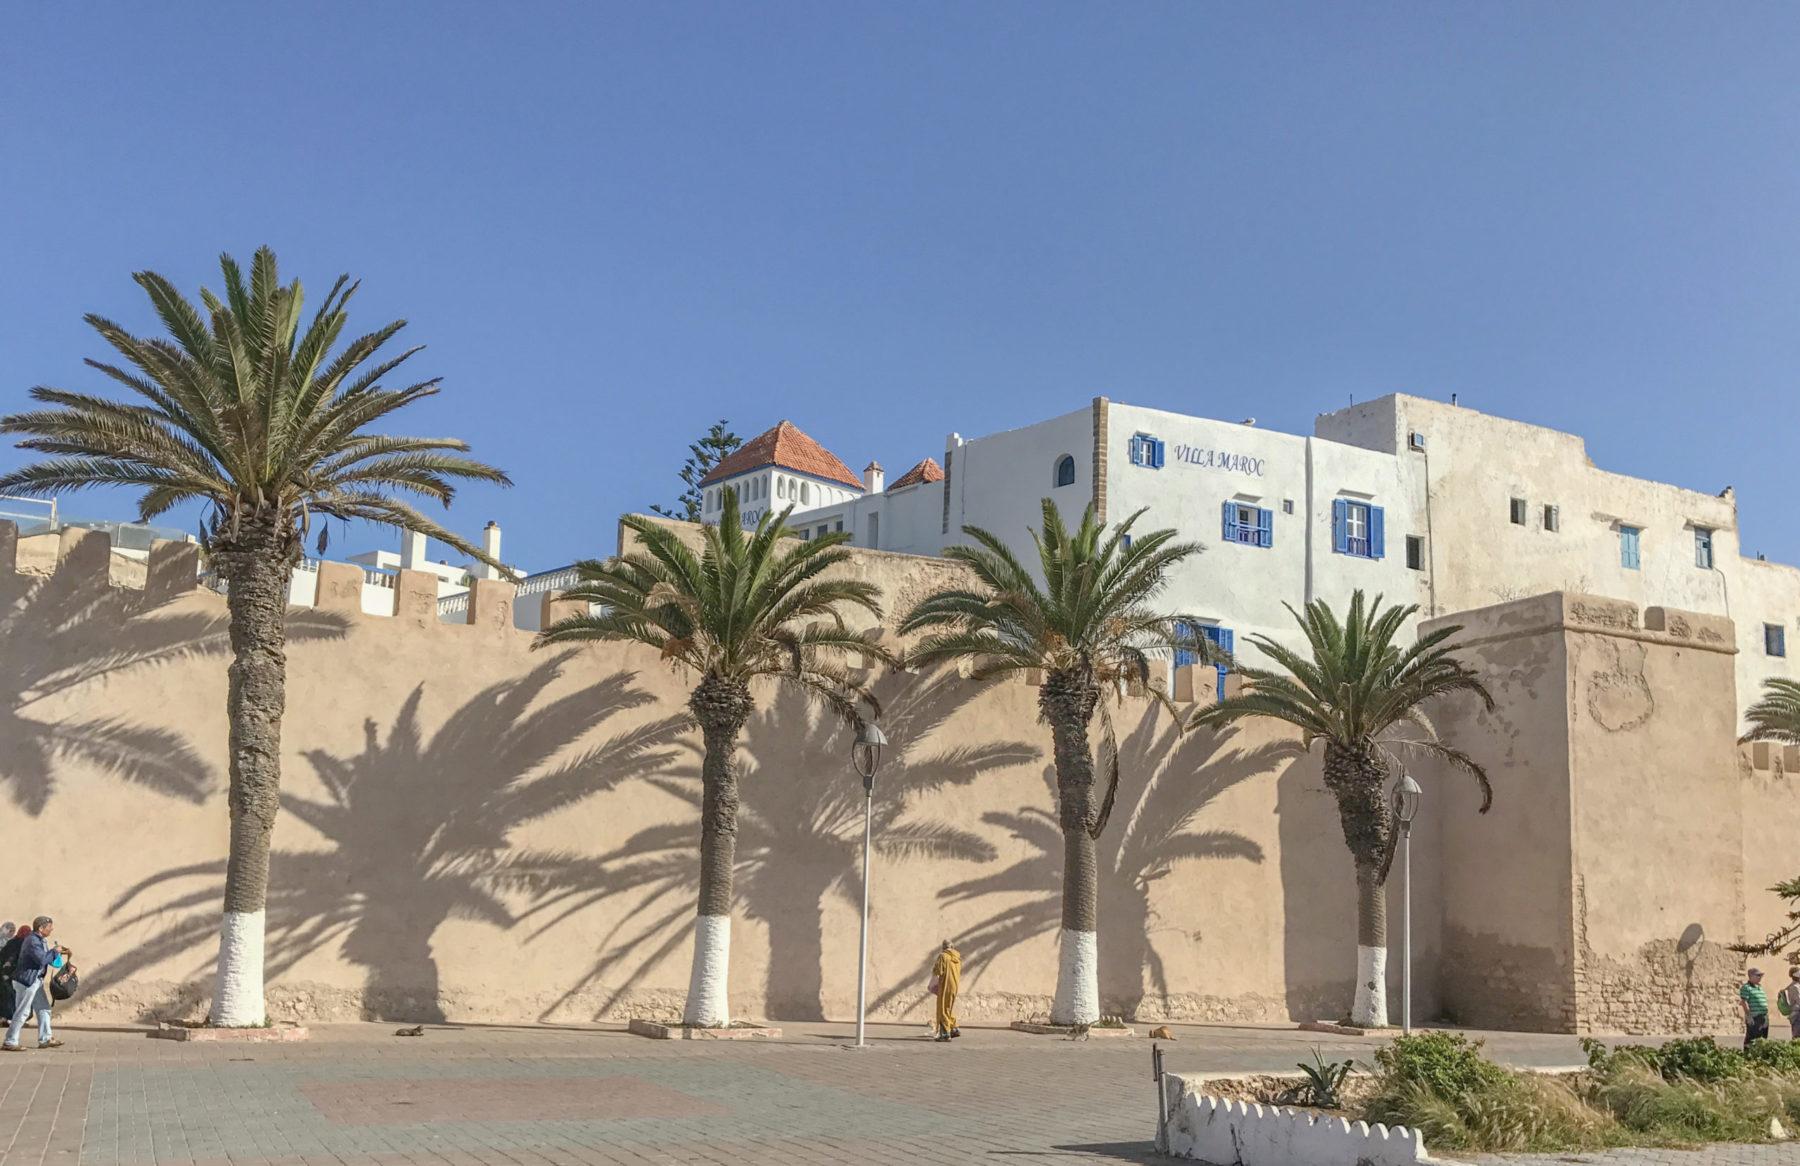 The mythical riad in essaouira hotel villa maroc - Les jardins de villa maroc essaouira ...